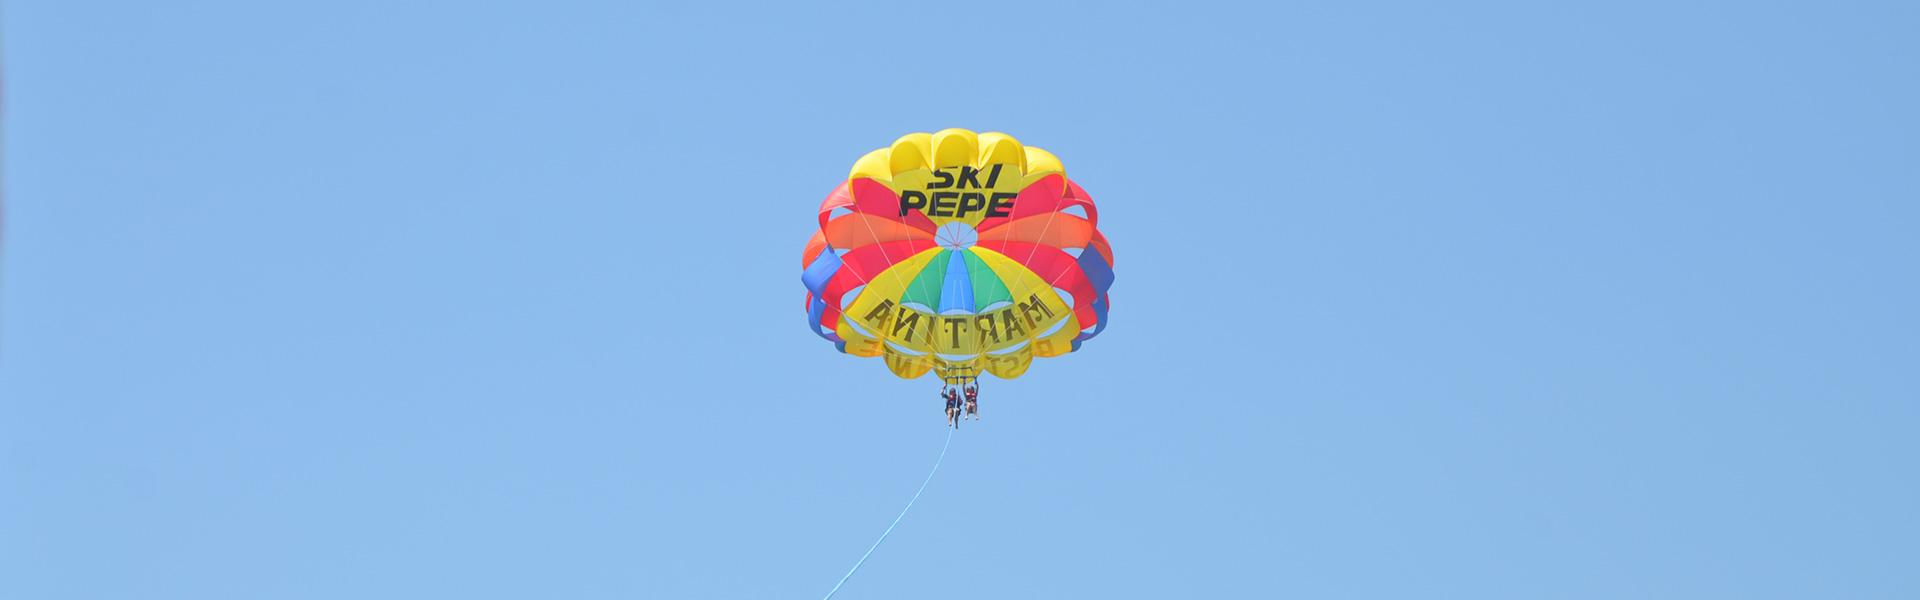 ski pepe watersports ibiza parasailing foto en es canar